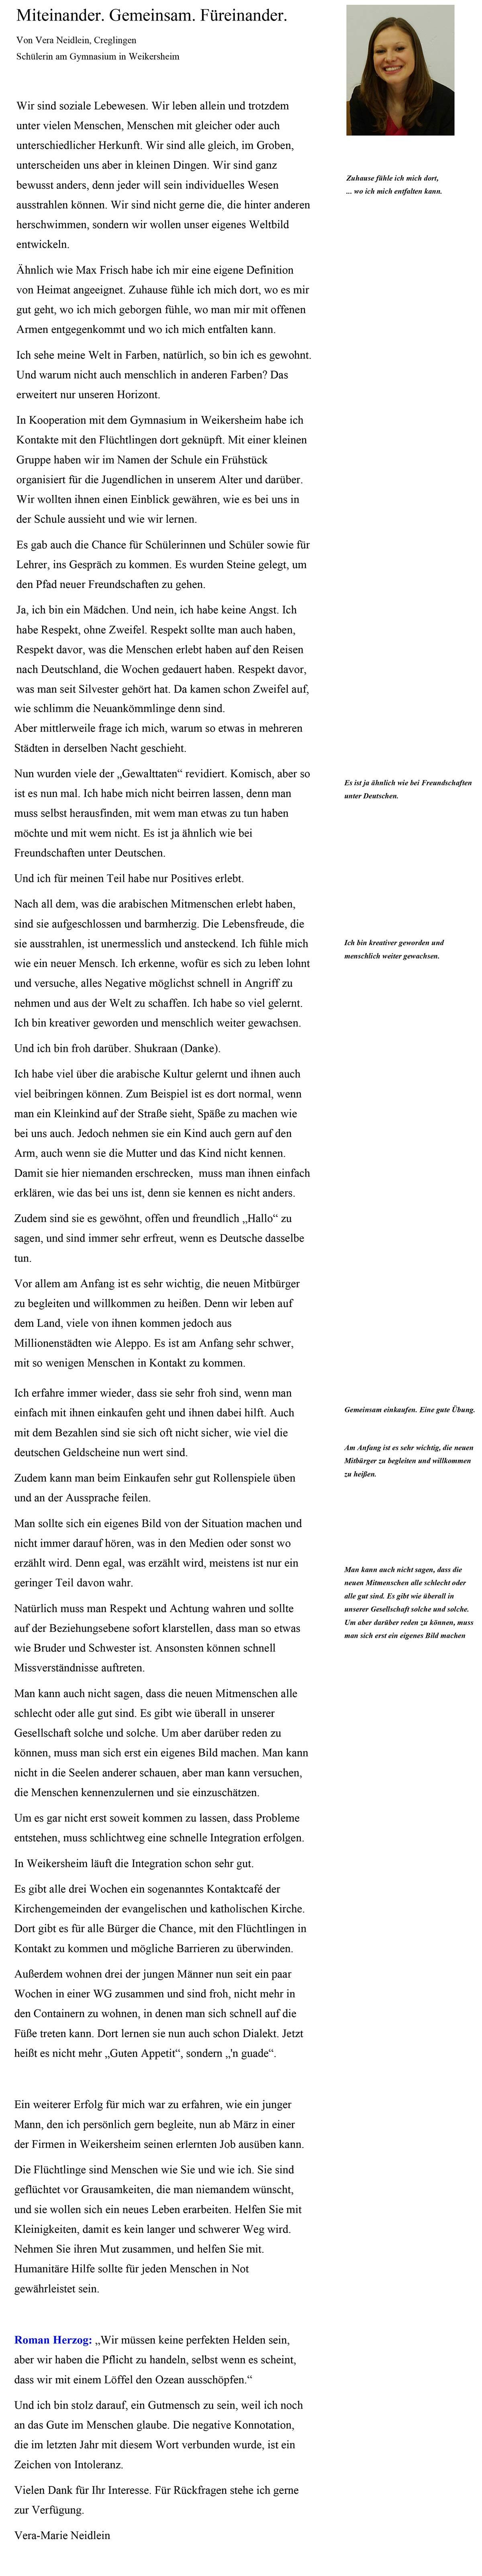 vera_bericht_wkm